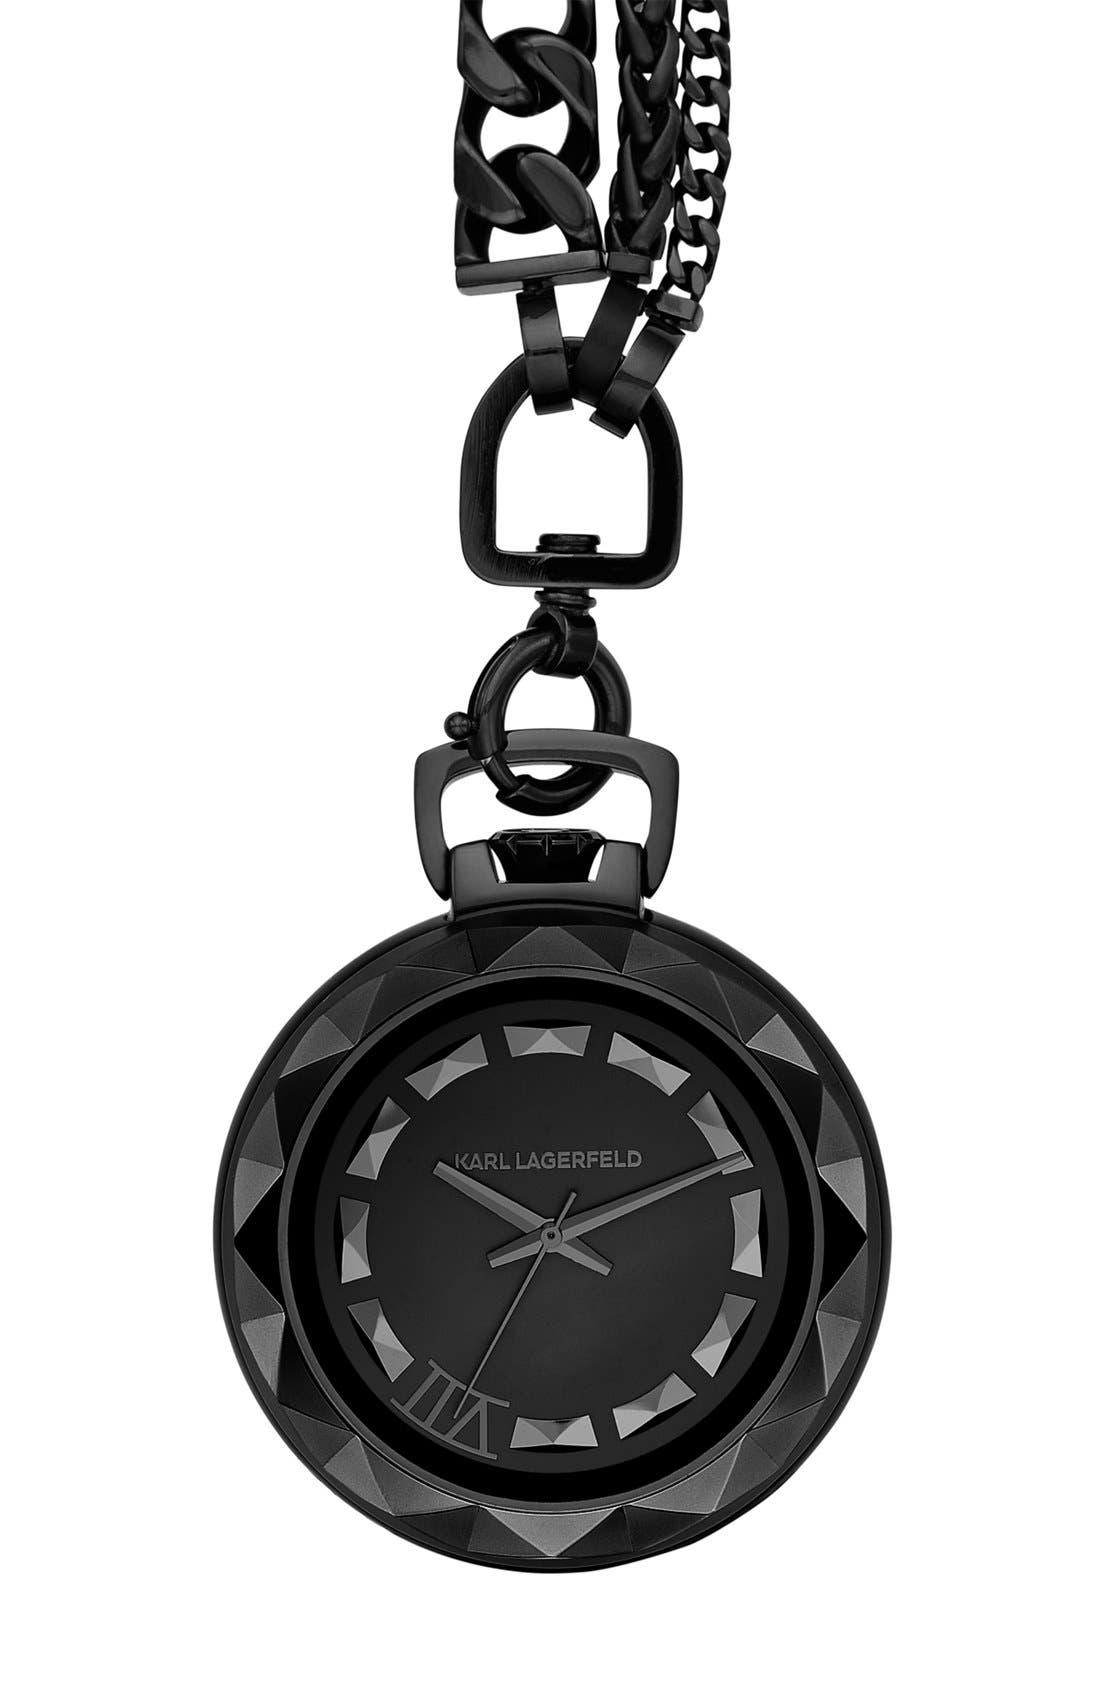 Alternate Image 1 Selected - KARL LAGERFELD '7' Pocket Watch, 45mm